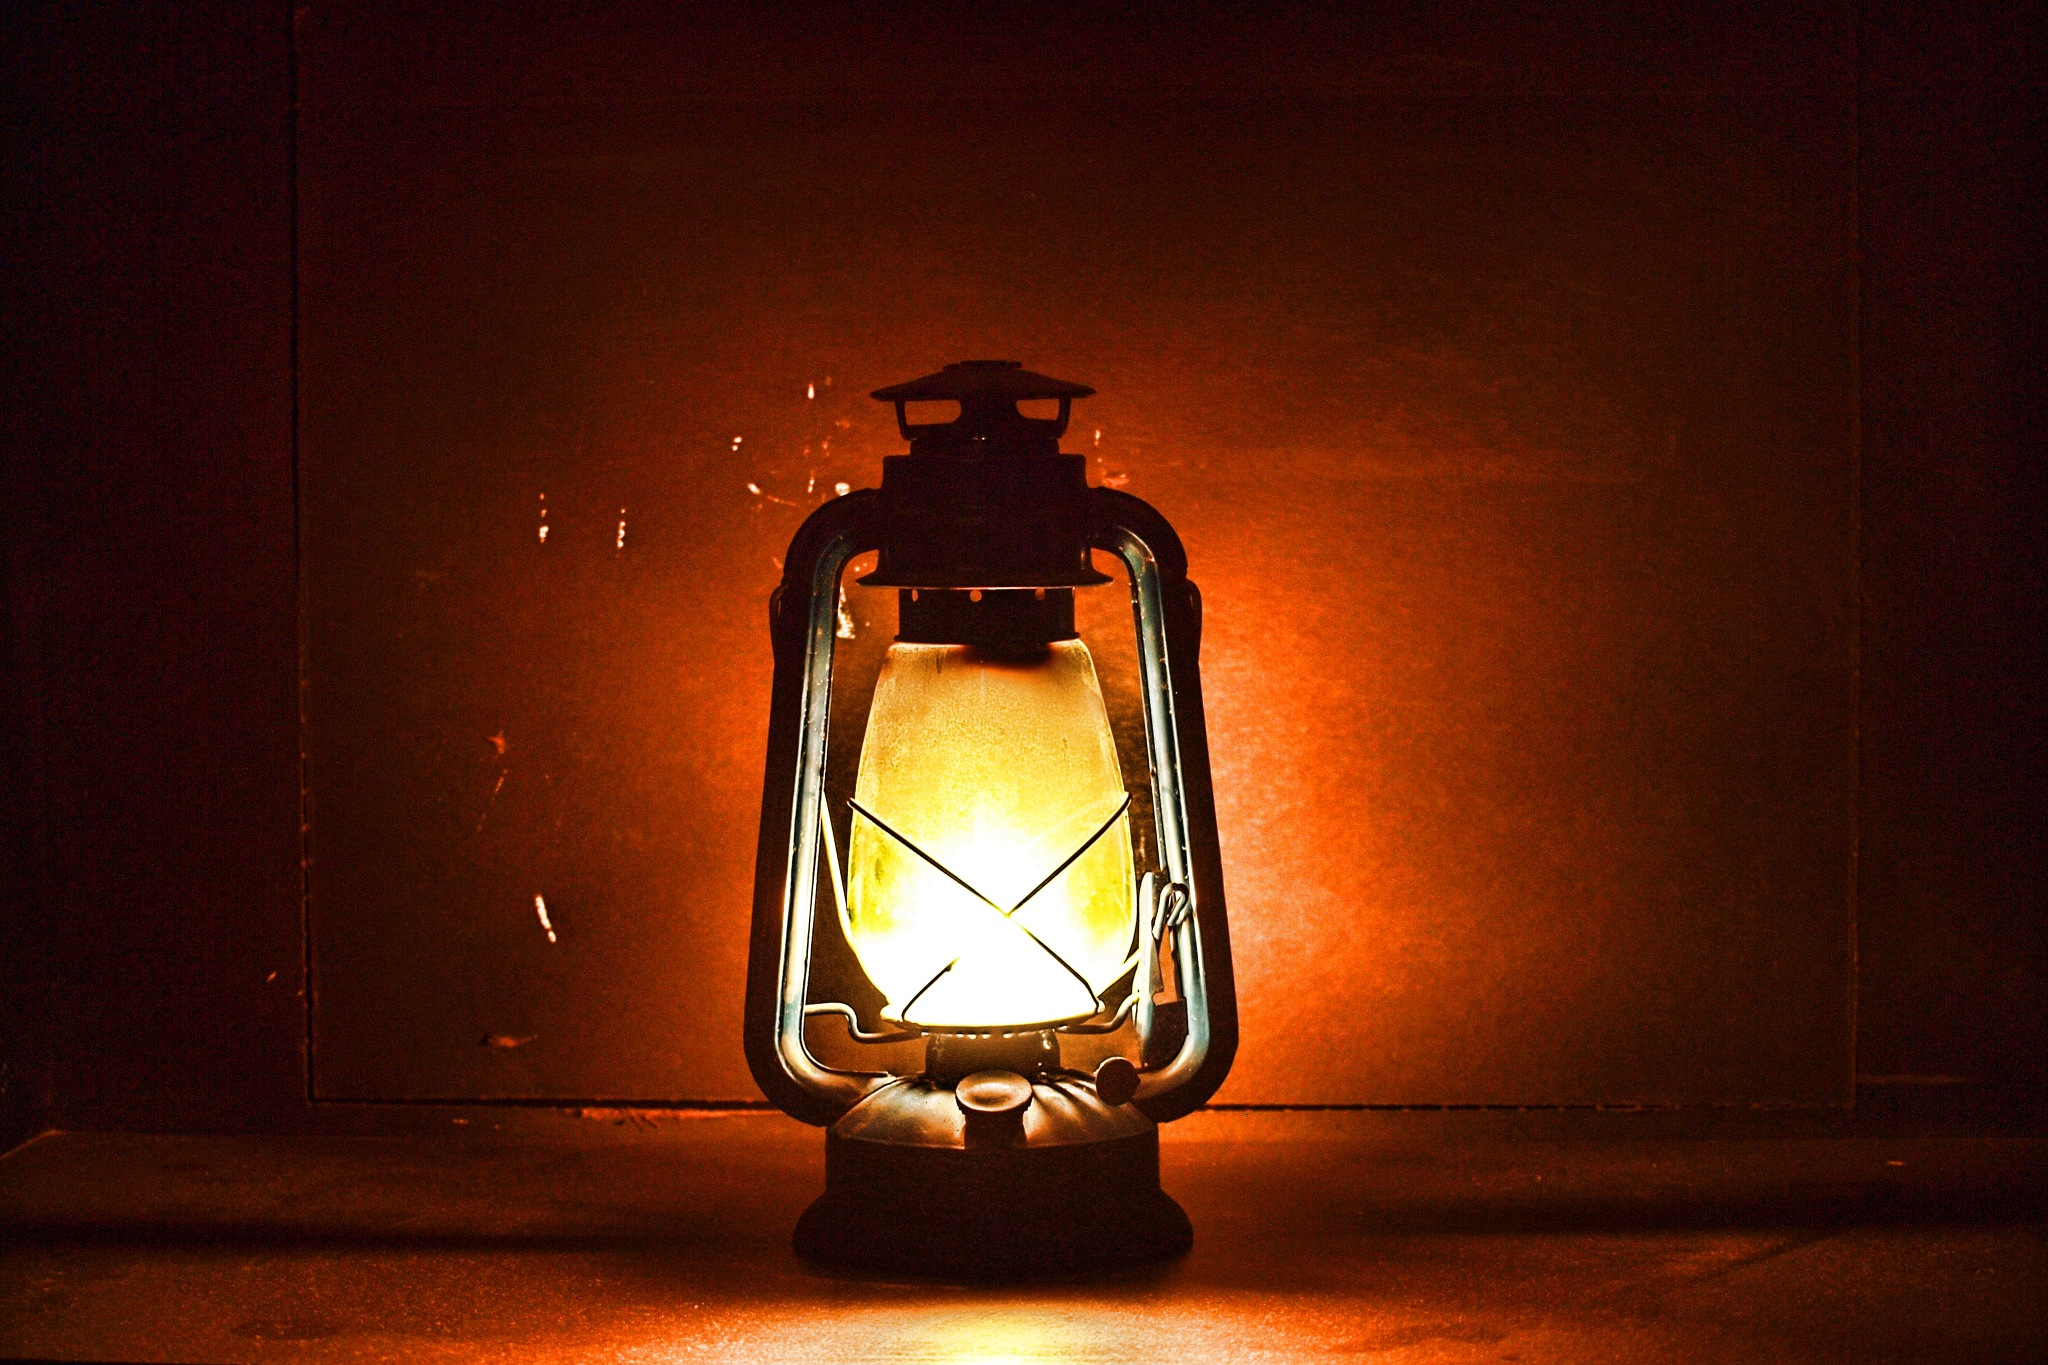 Hang a lantern on your problem. by Sadiq Ali AlQatari